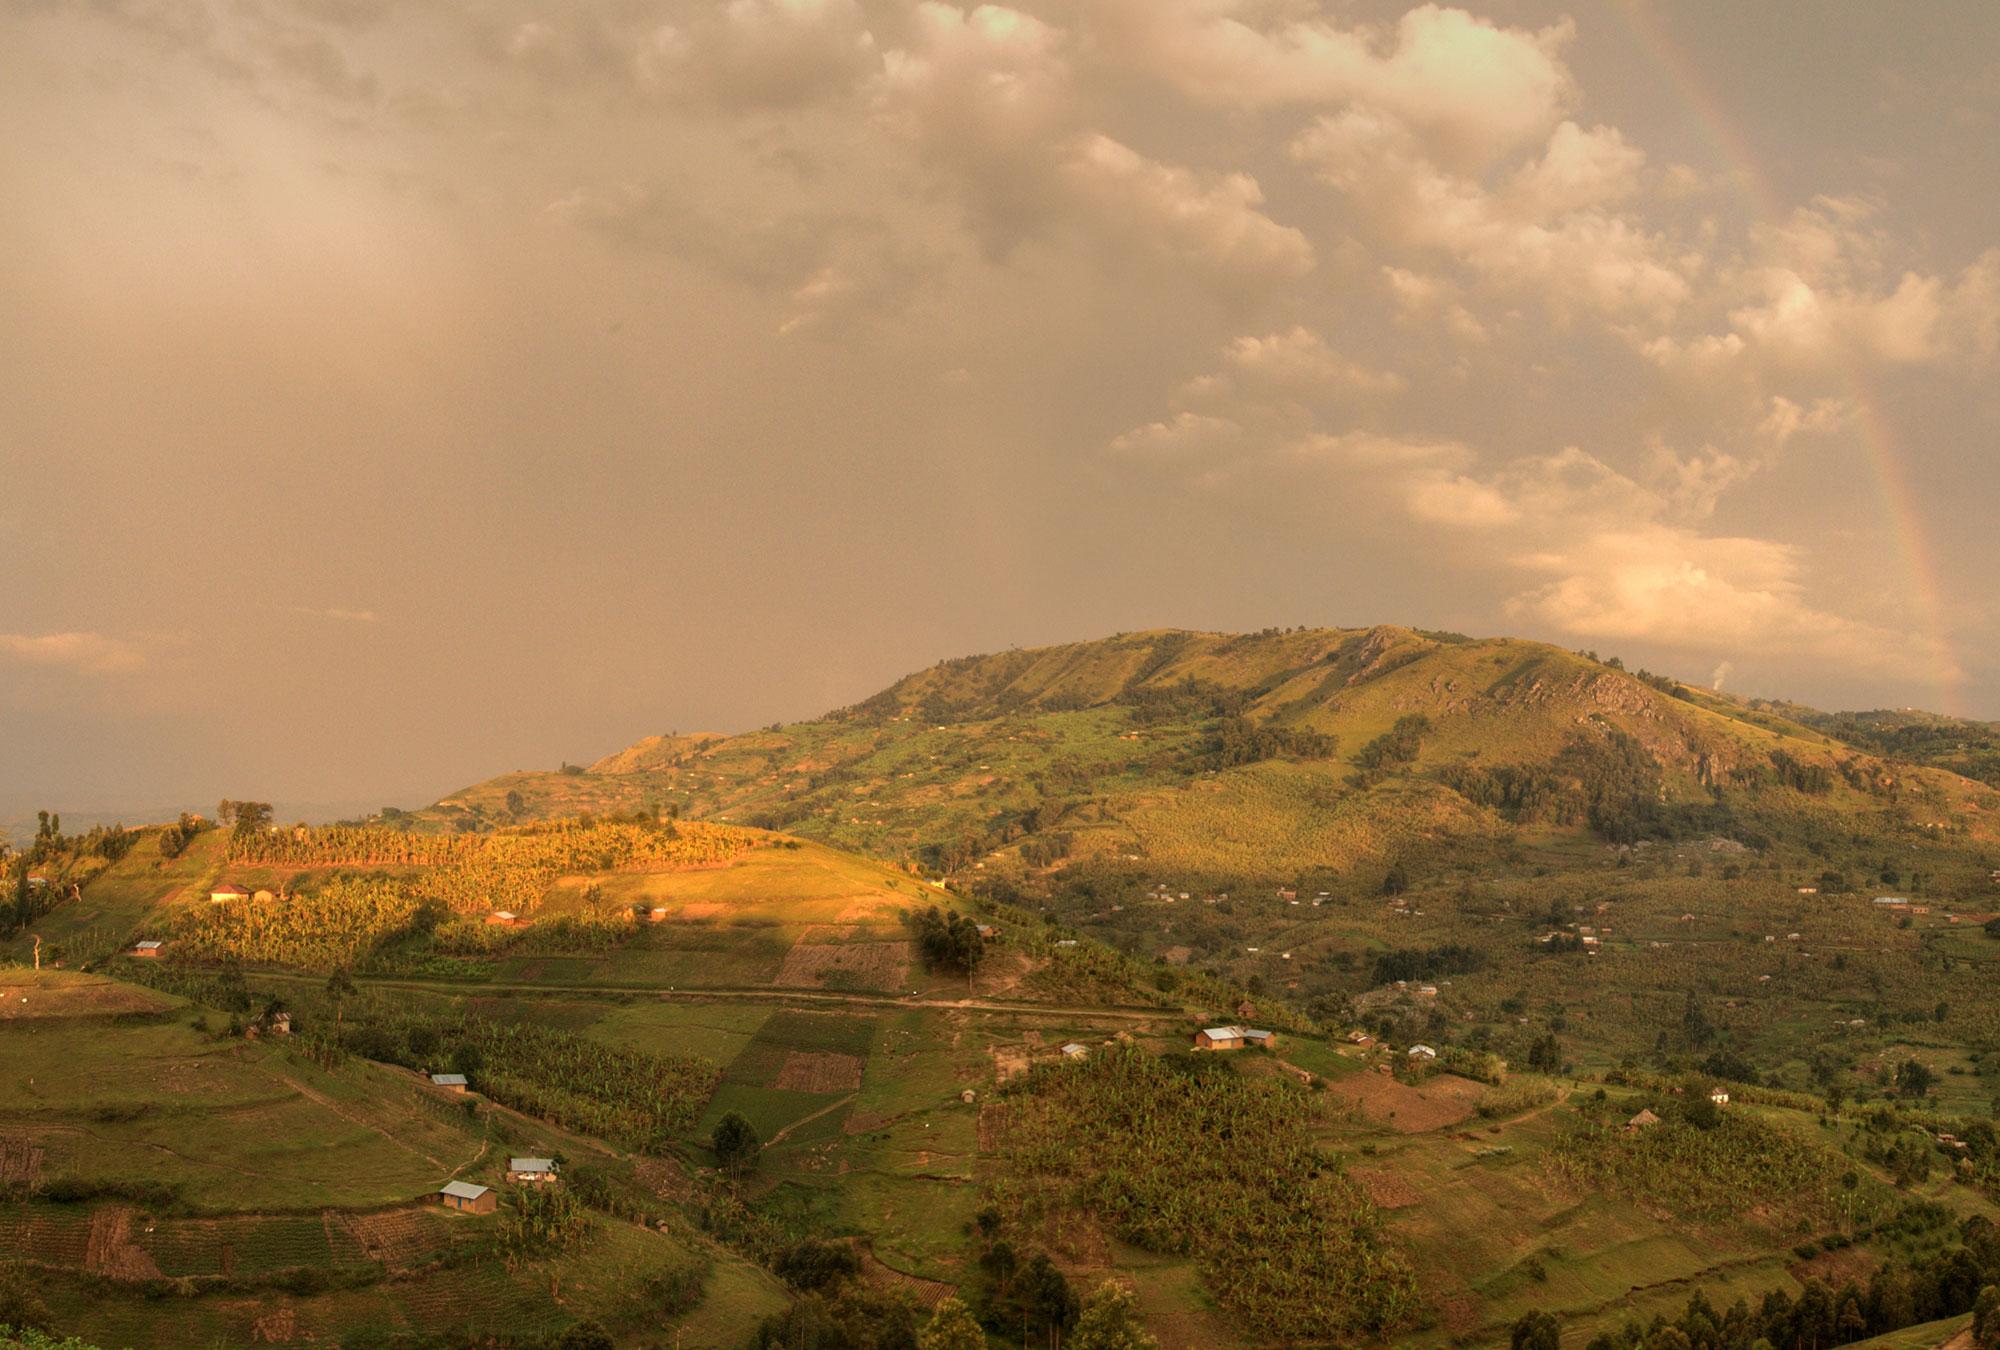 A sloping landscape in western Uganda